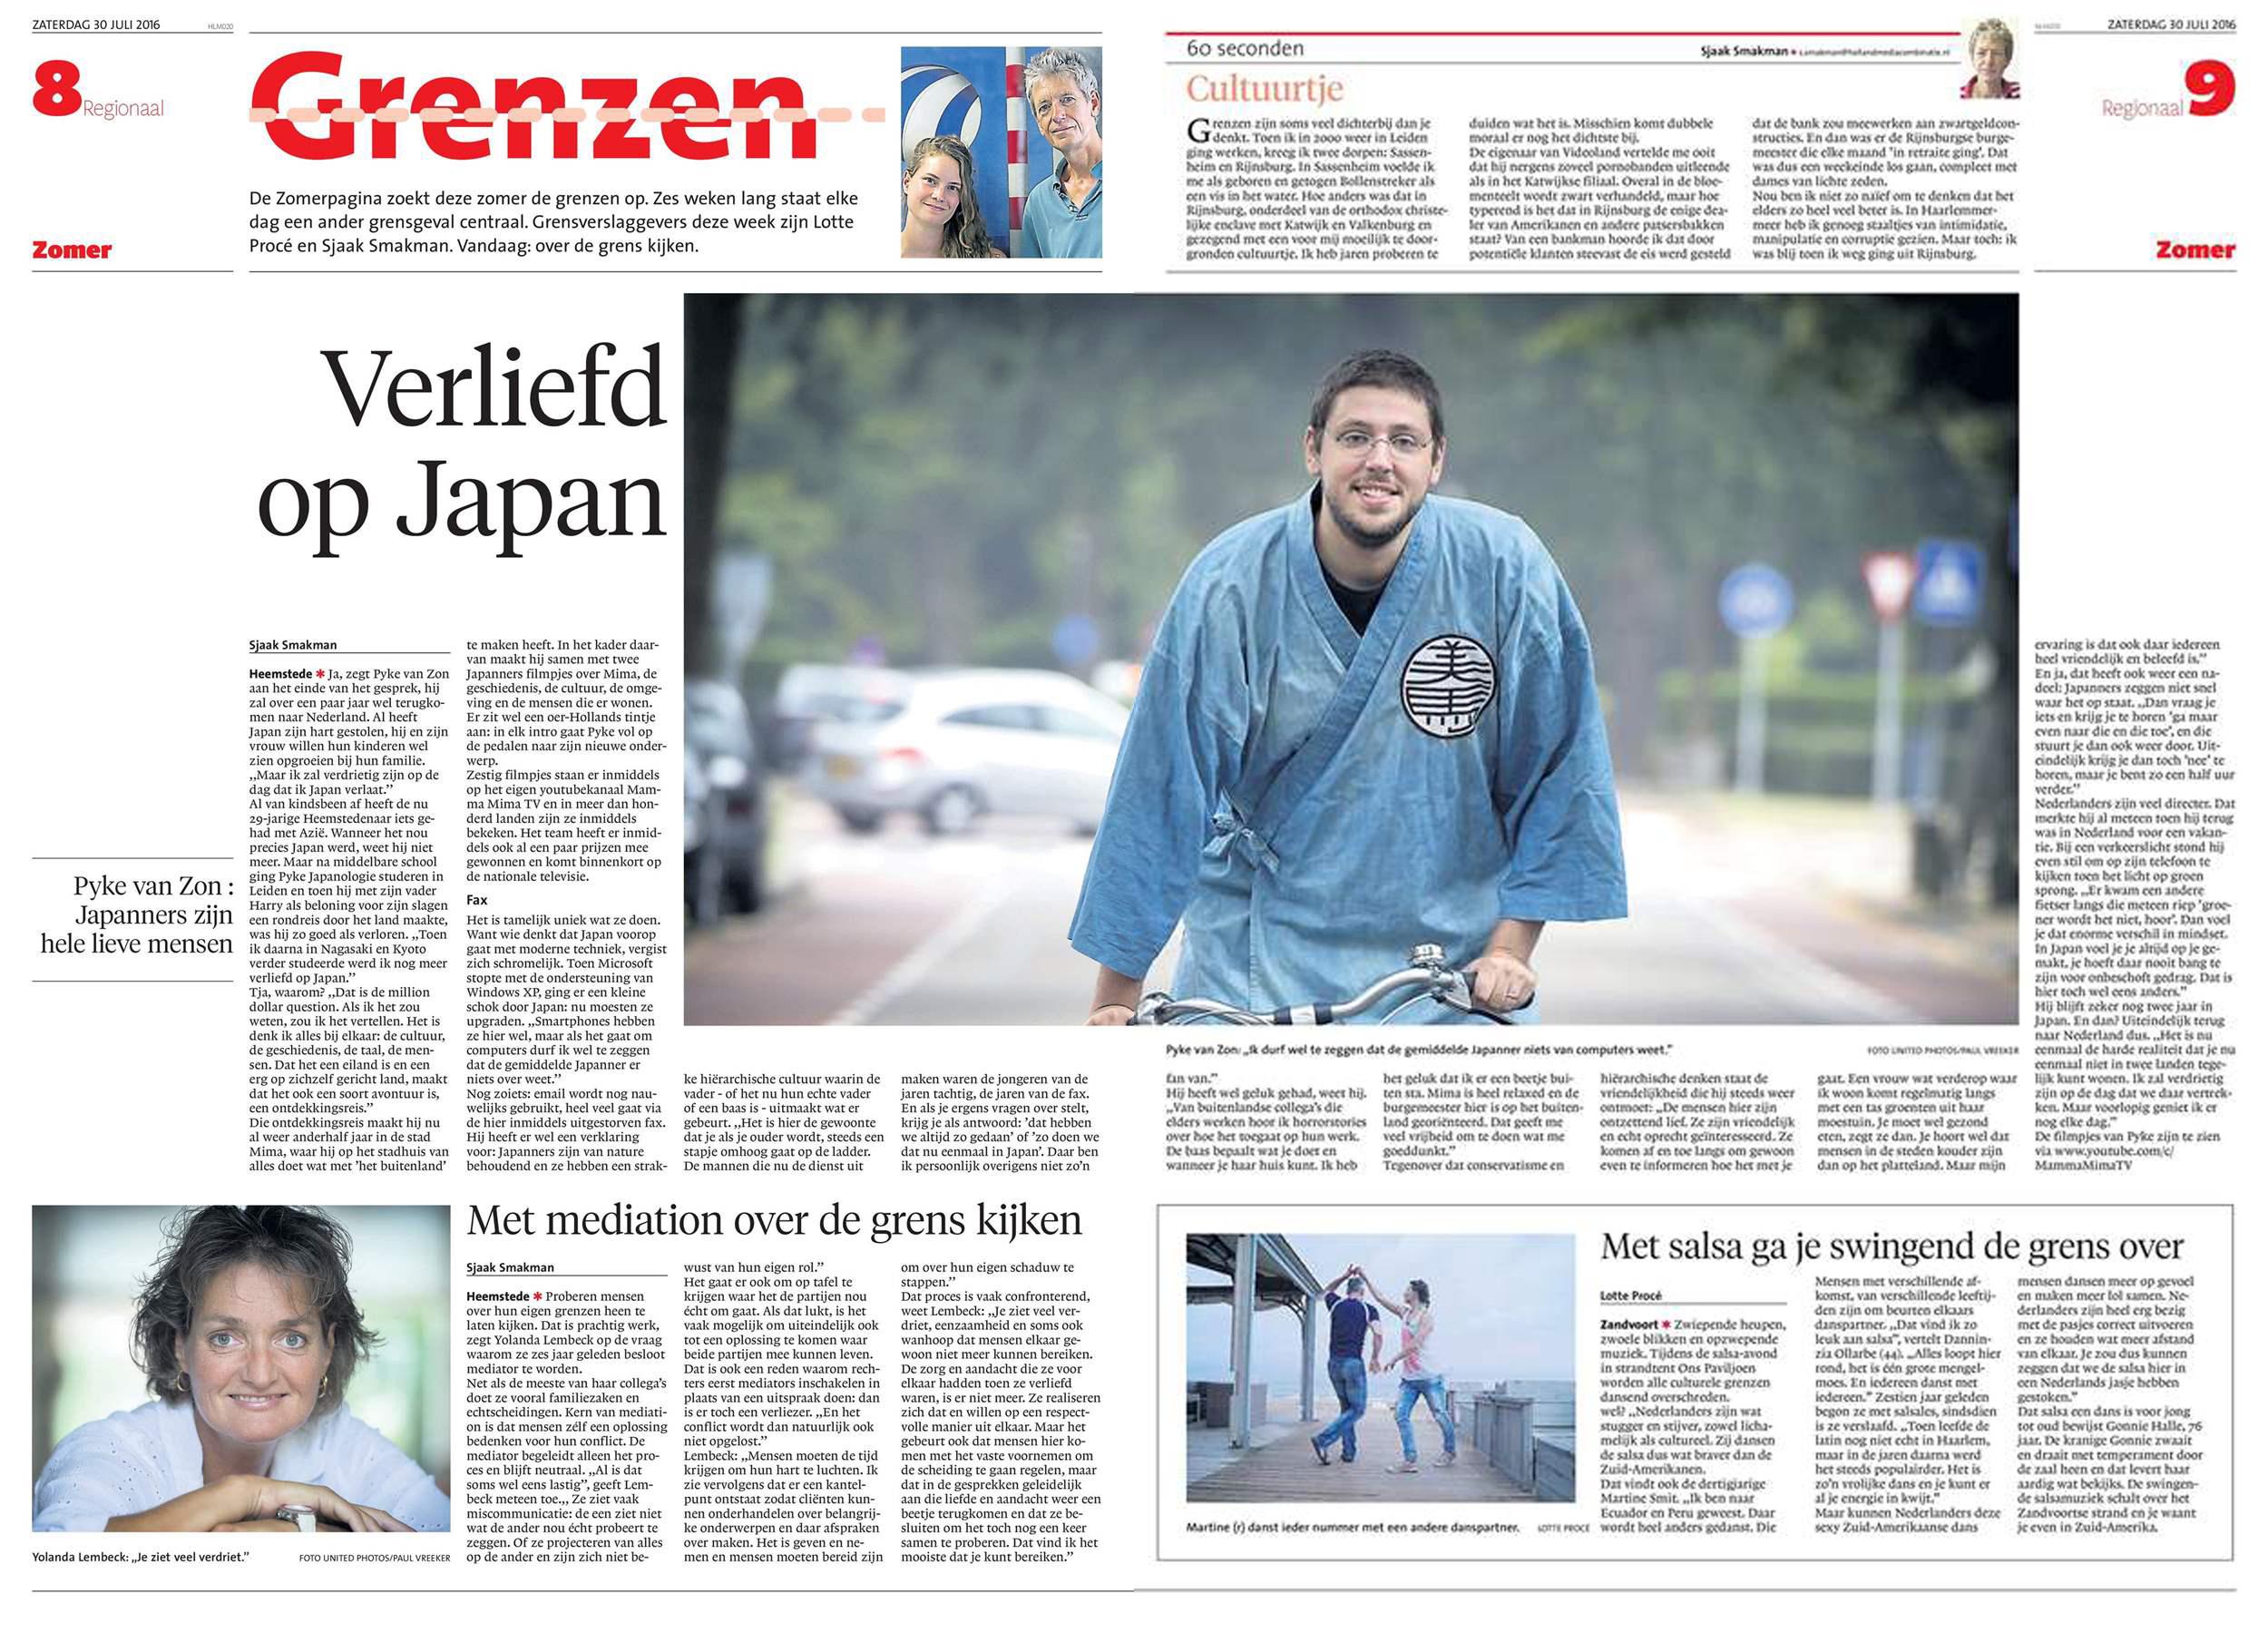 Haarlems Dagblad (Sat. July 30th, 2016)